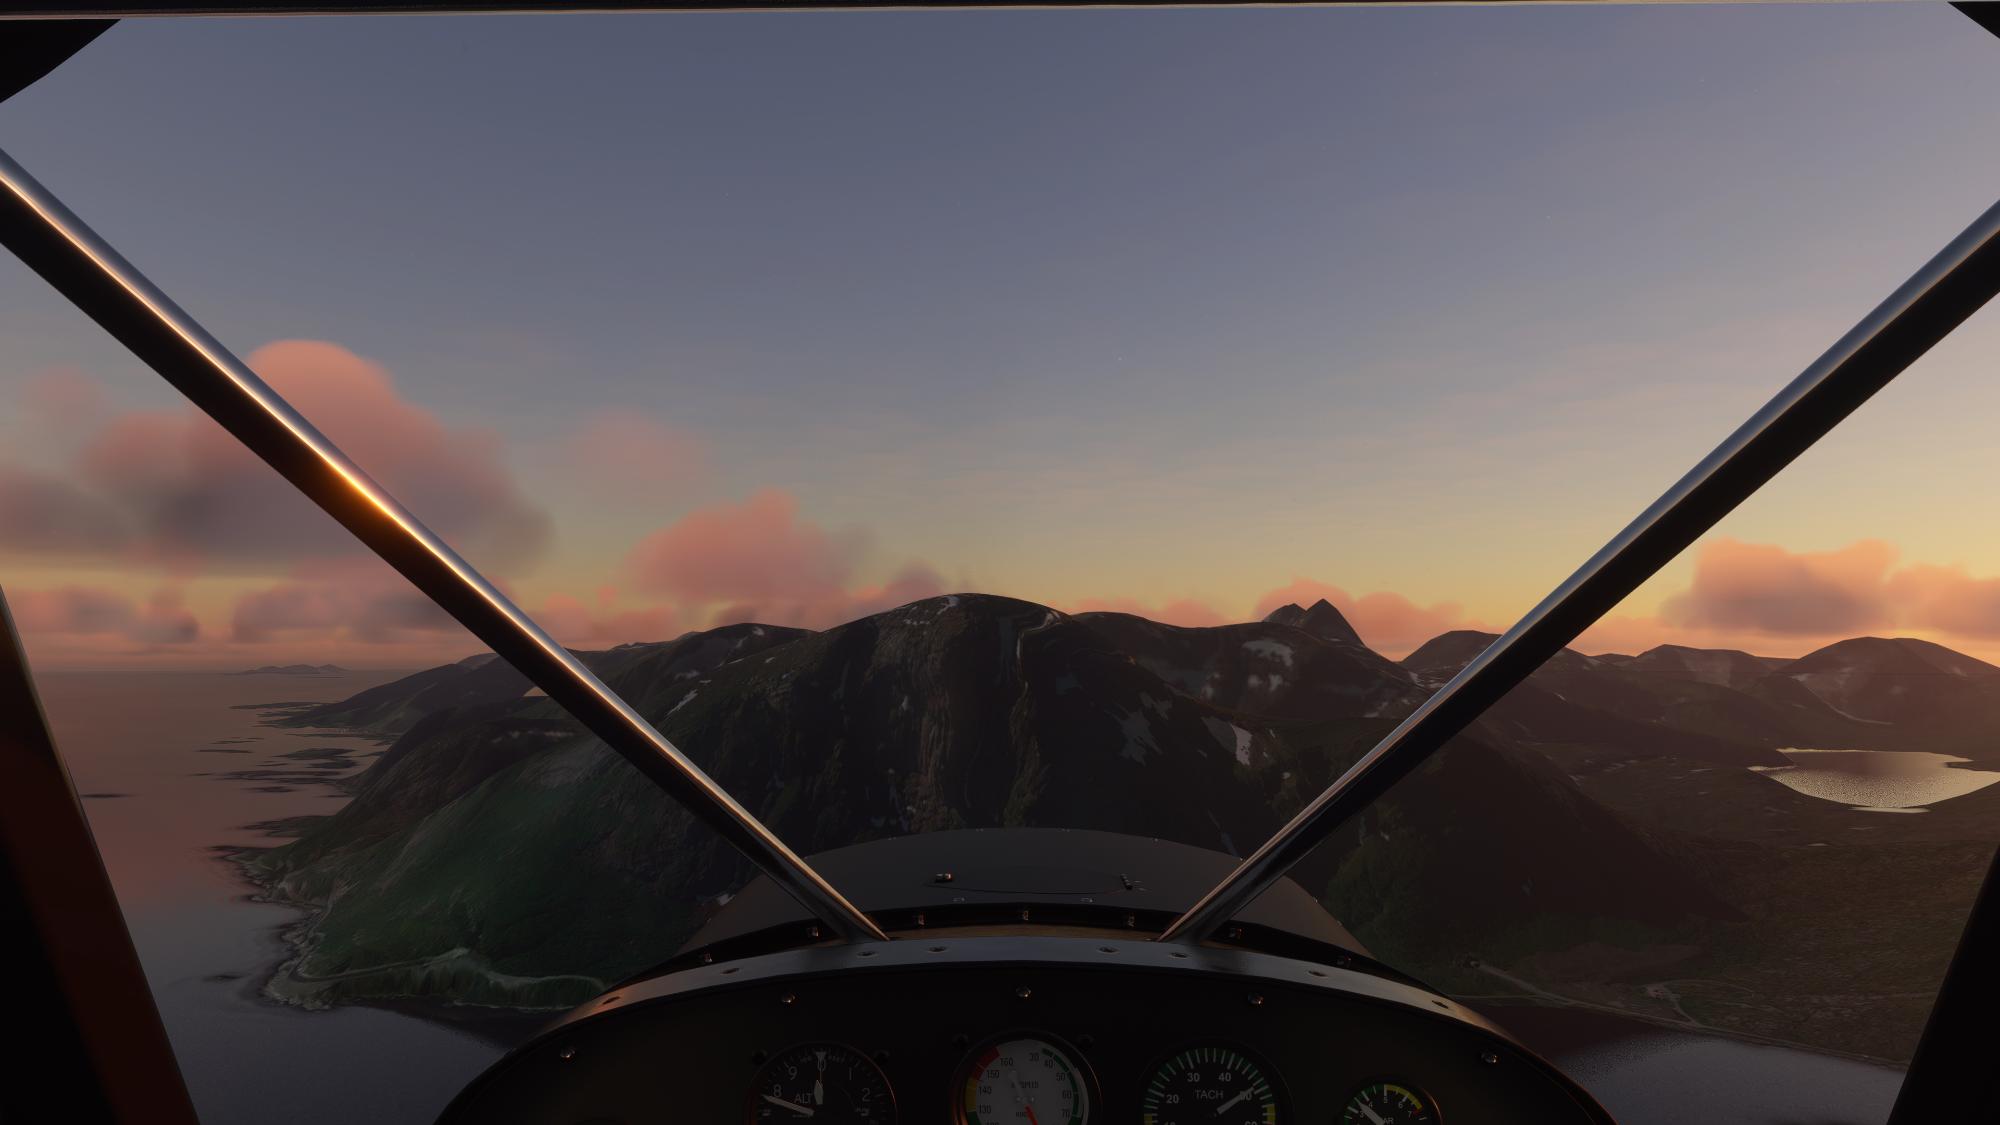 Microsoft Flight Simulator - 1.15.10.0 07.05.2021 23_03_59.png